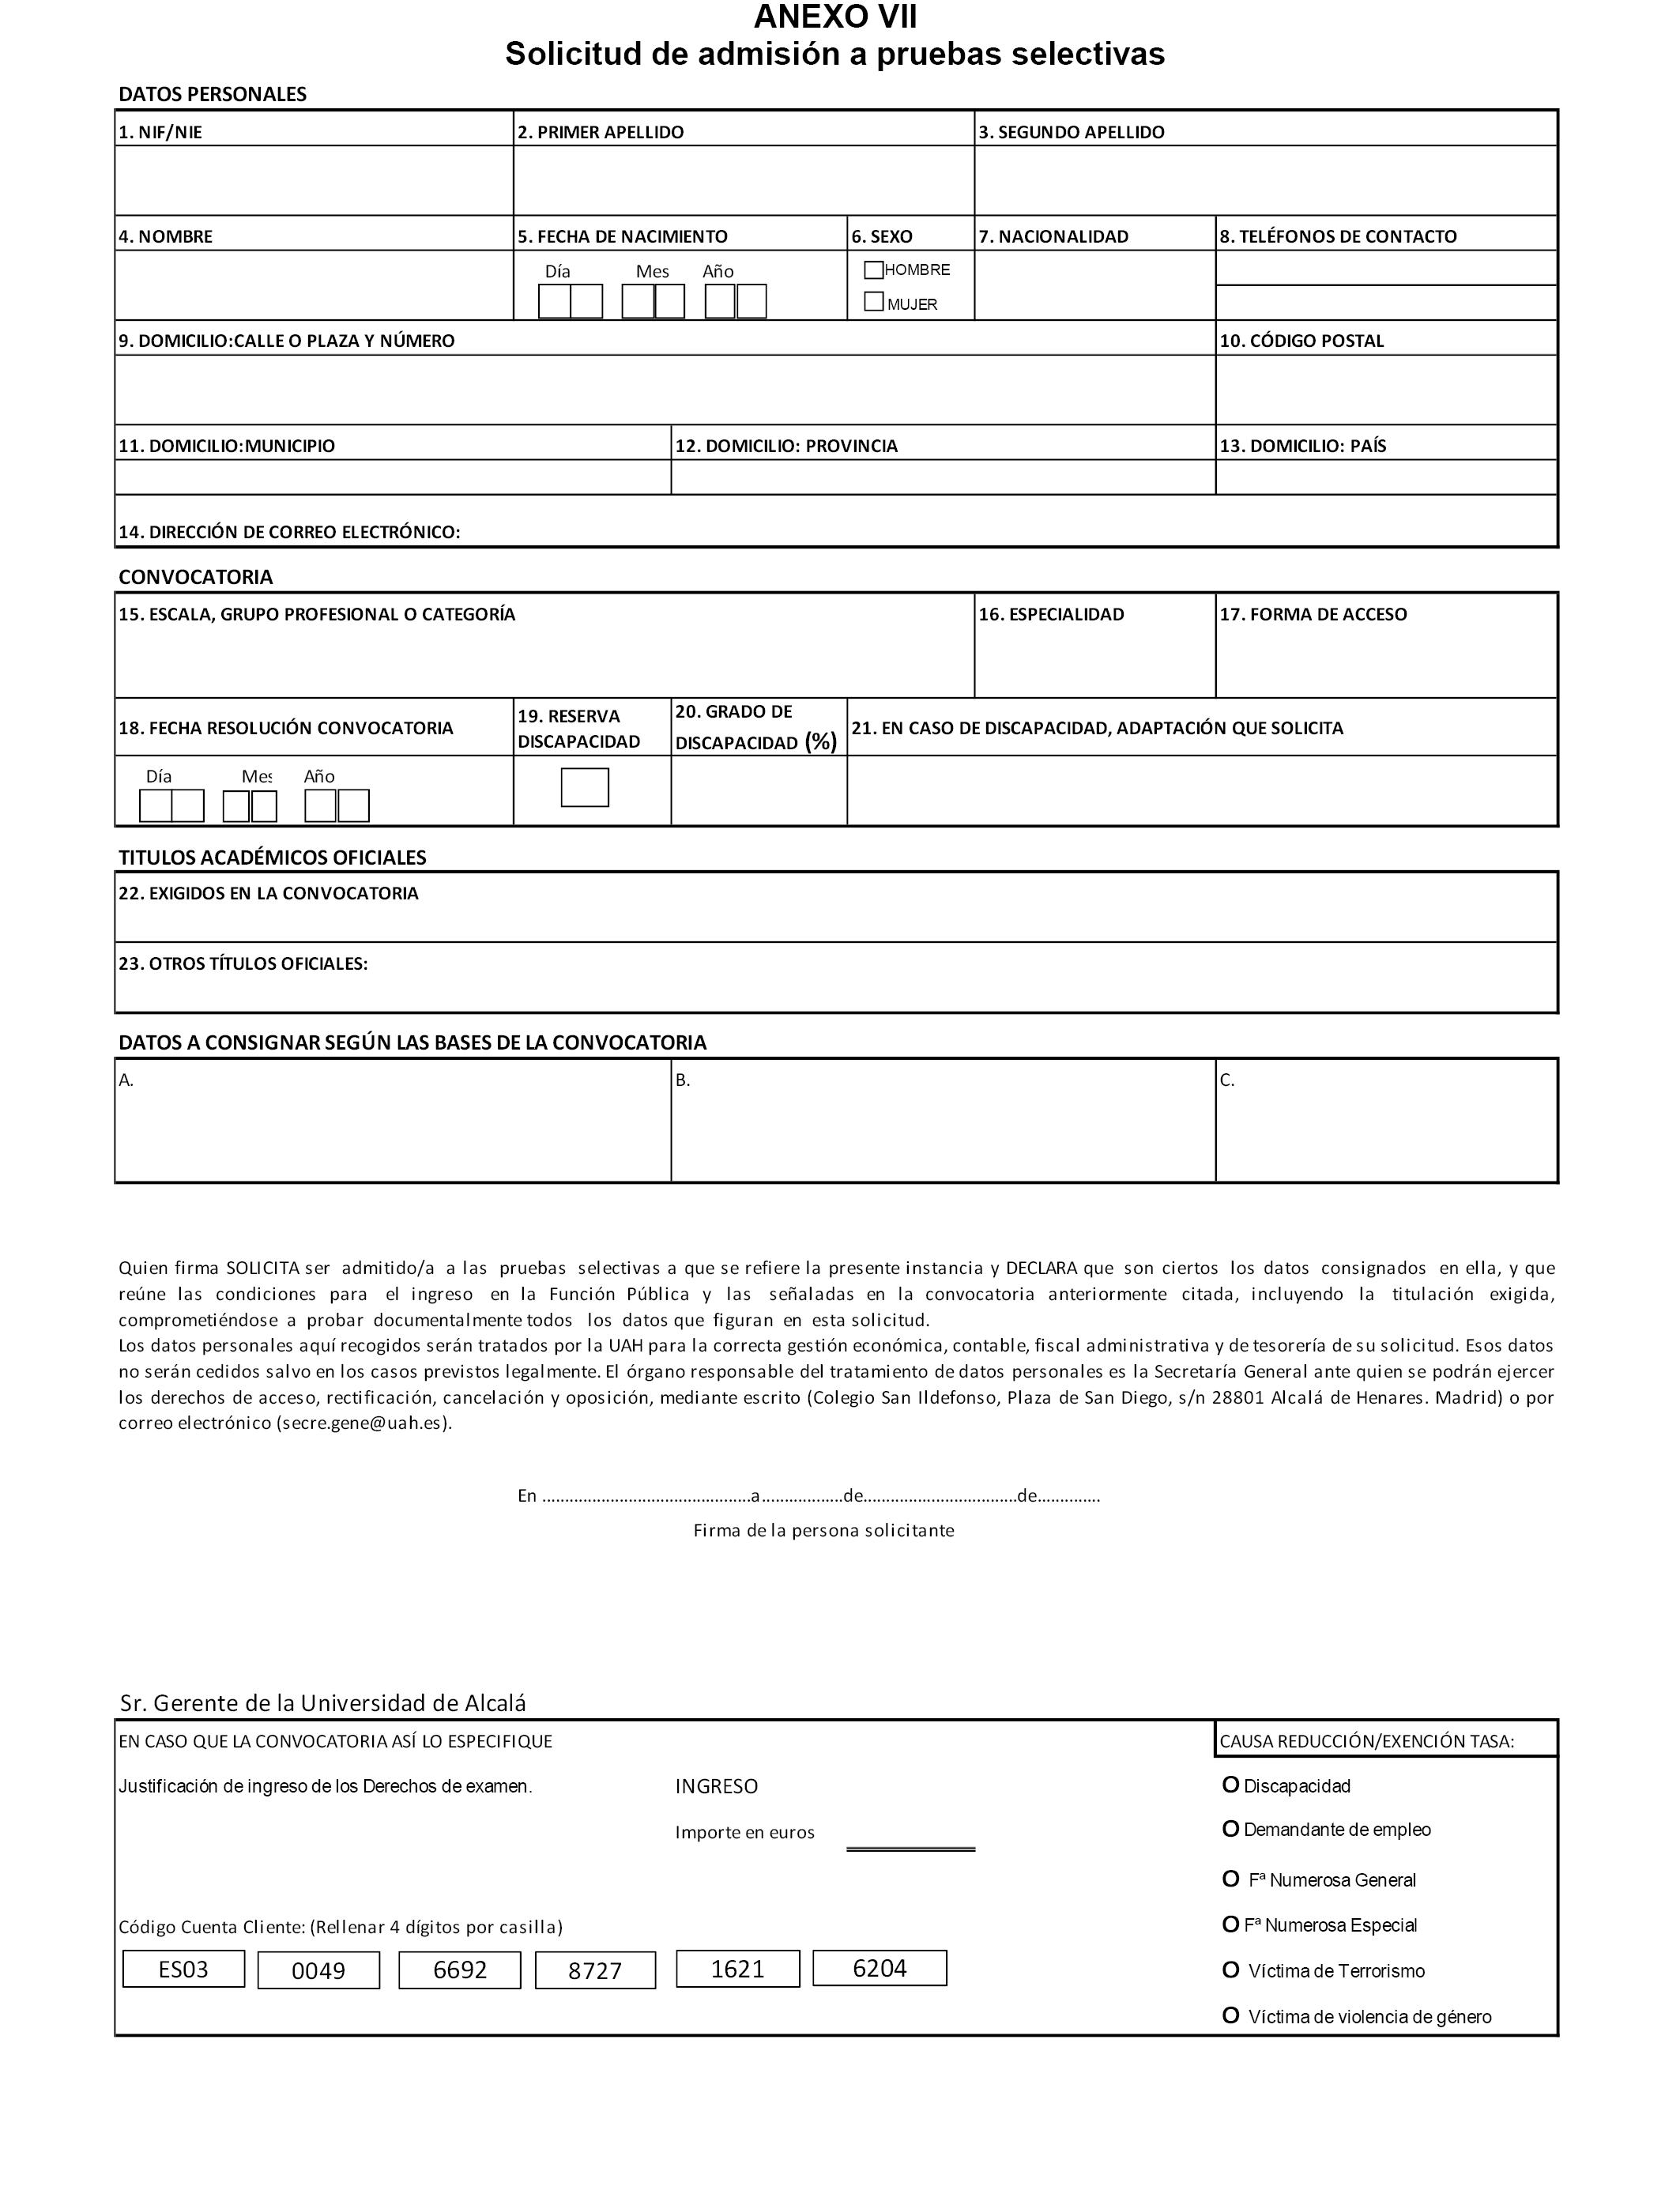 BOE.es - Documento BOE-A-2018-4597